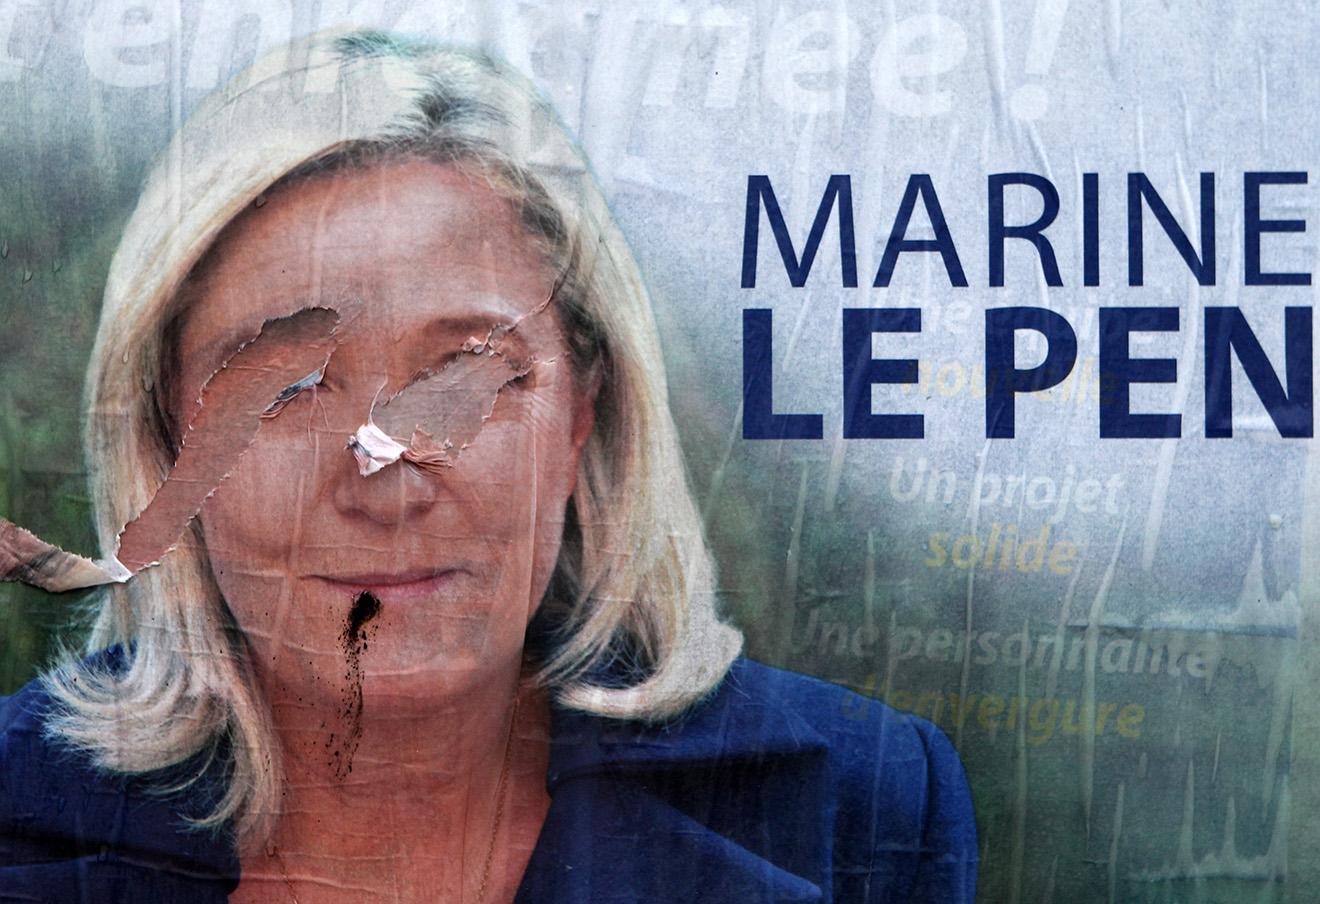 Разорванный плакат лидера французской ультраправой партии Марин Ле Пен. Энен-Бомон, Франция, 2015 год. Фото: Michel Spingler / AP / East News